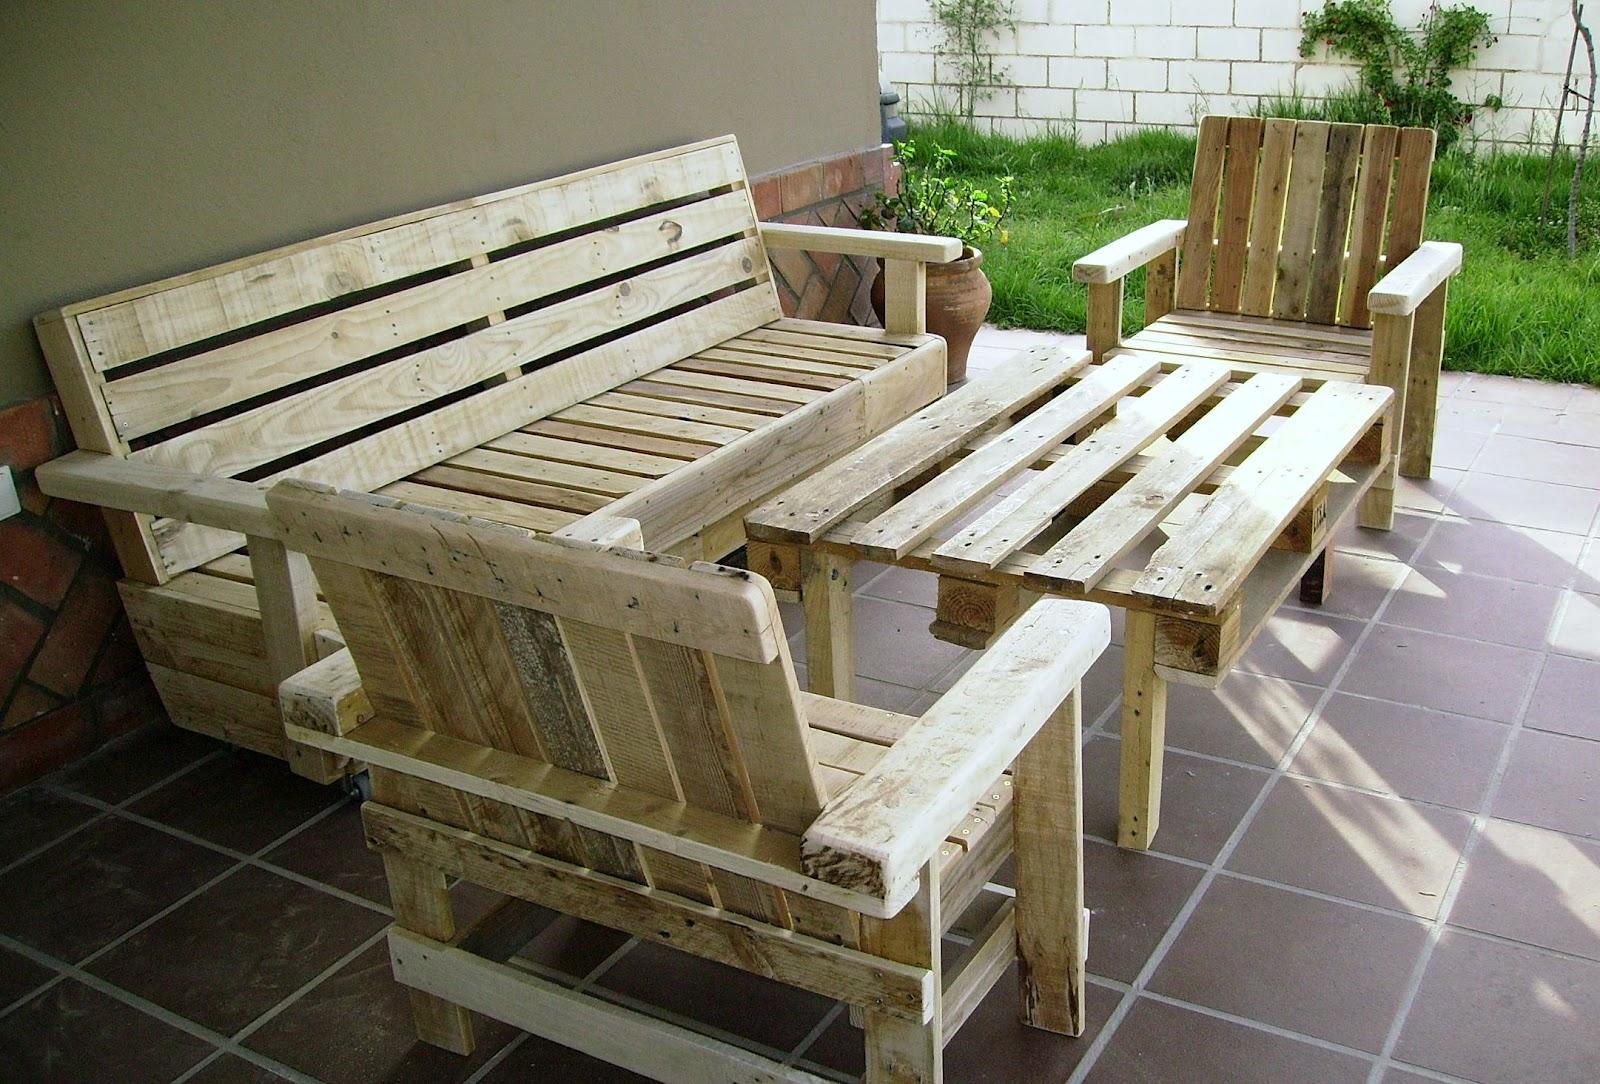 Artesanias labea muebles de exterior 100 reciclados for Muebles de palets reciclados